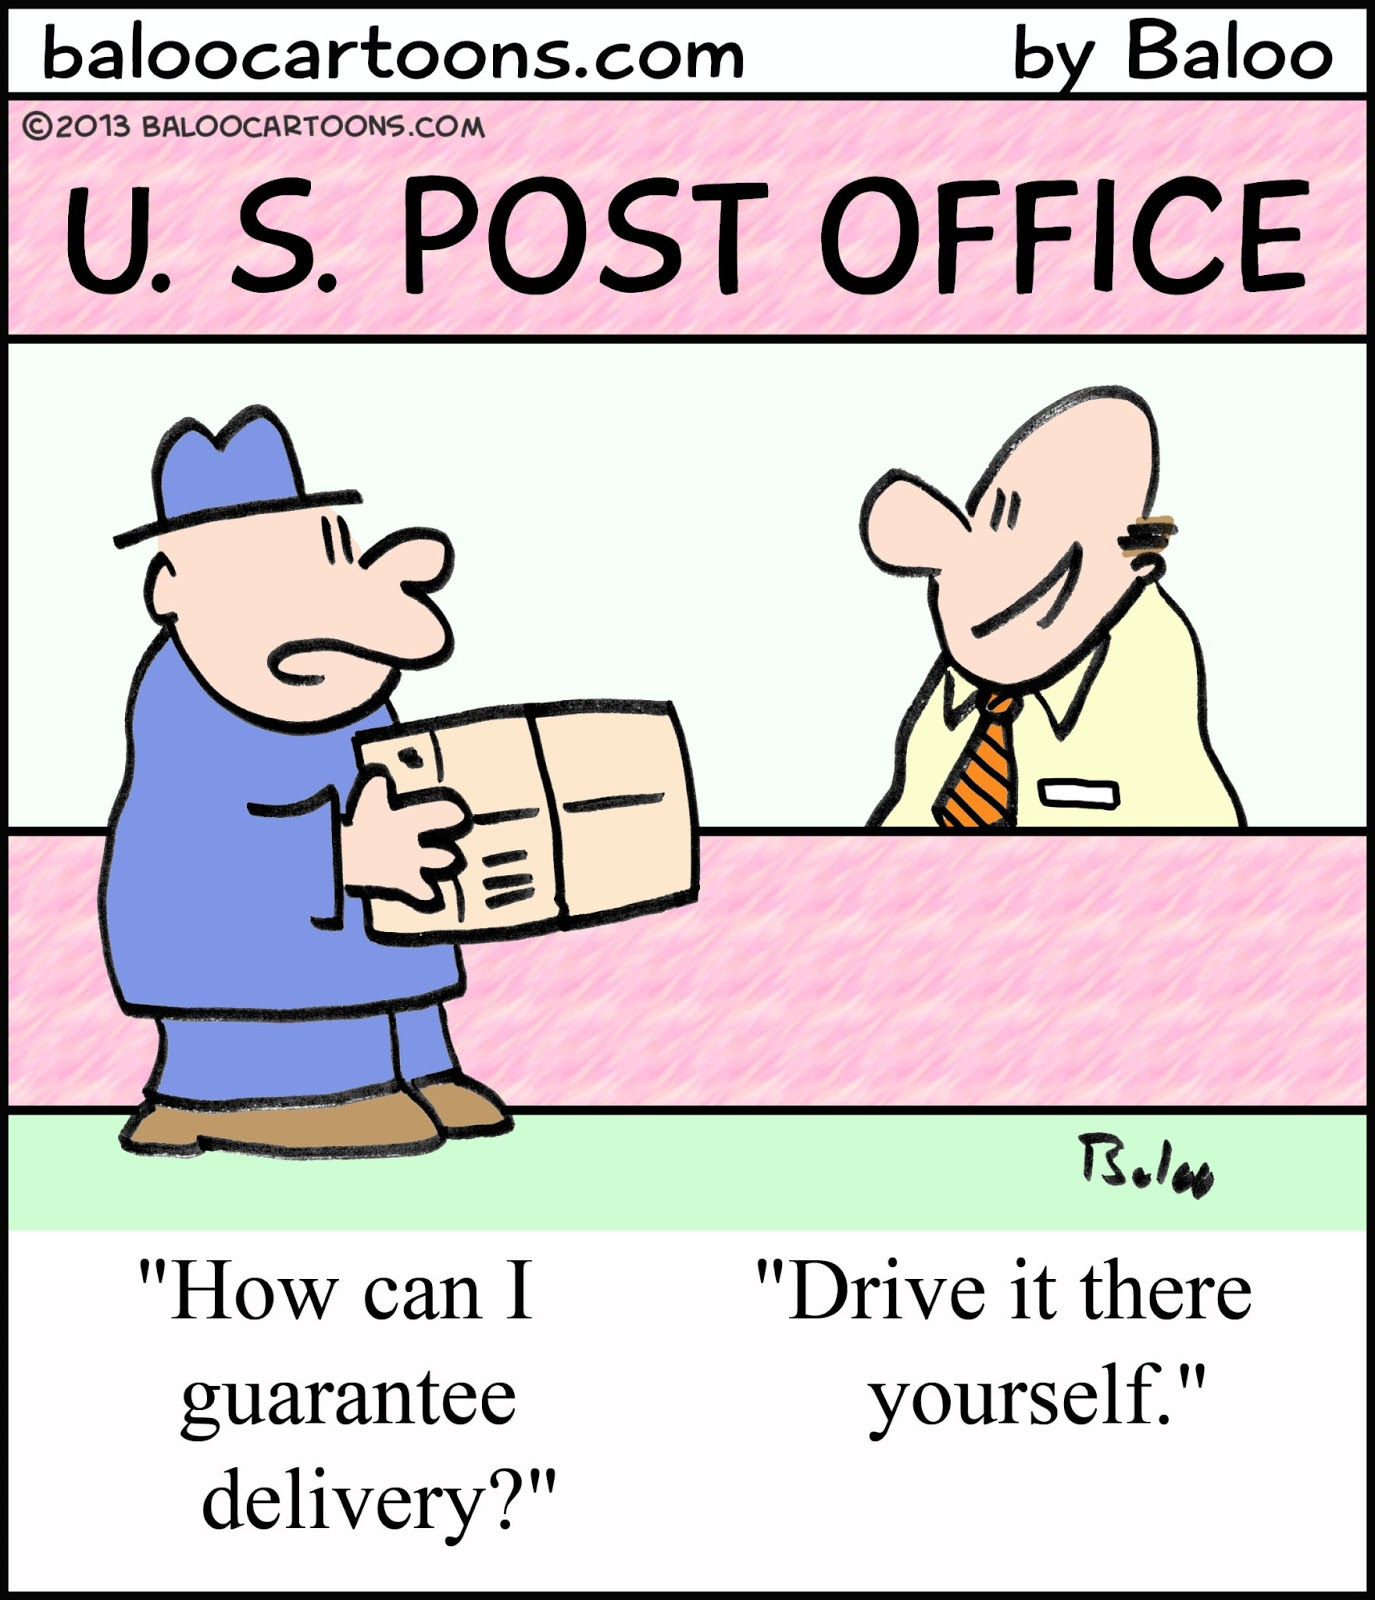 Baloos cartoon blog post office cartoon post office cartoon solutioingenieria Gallery